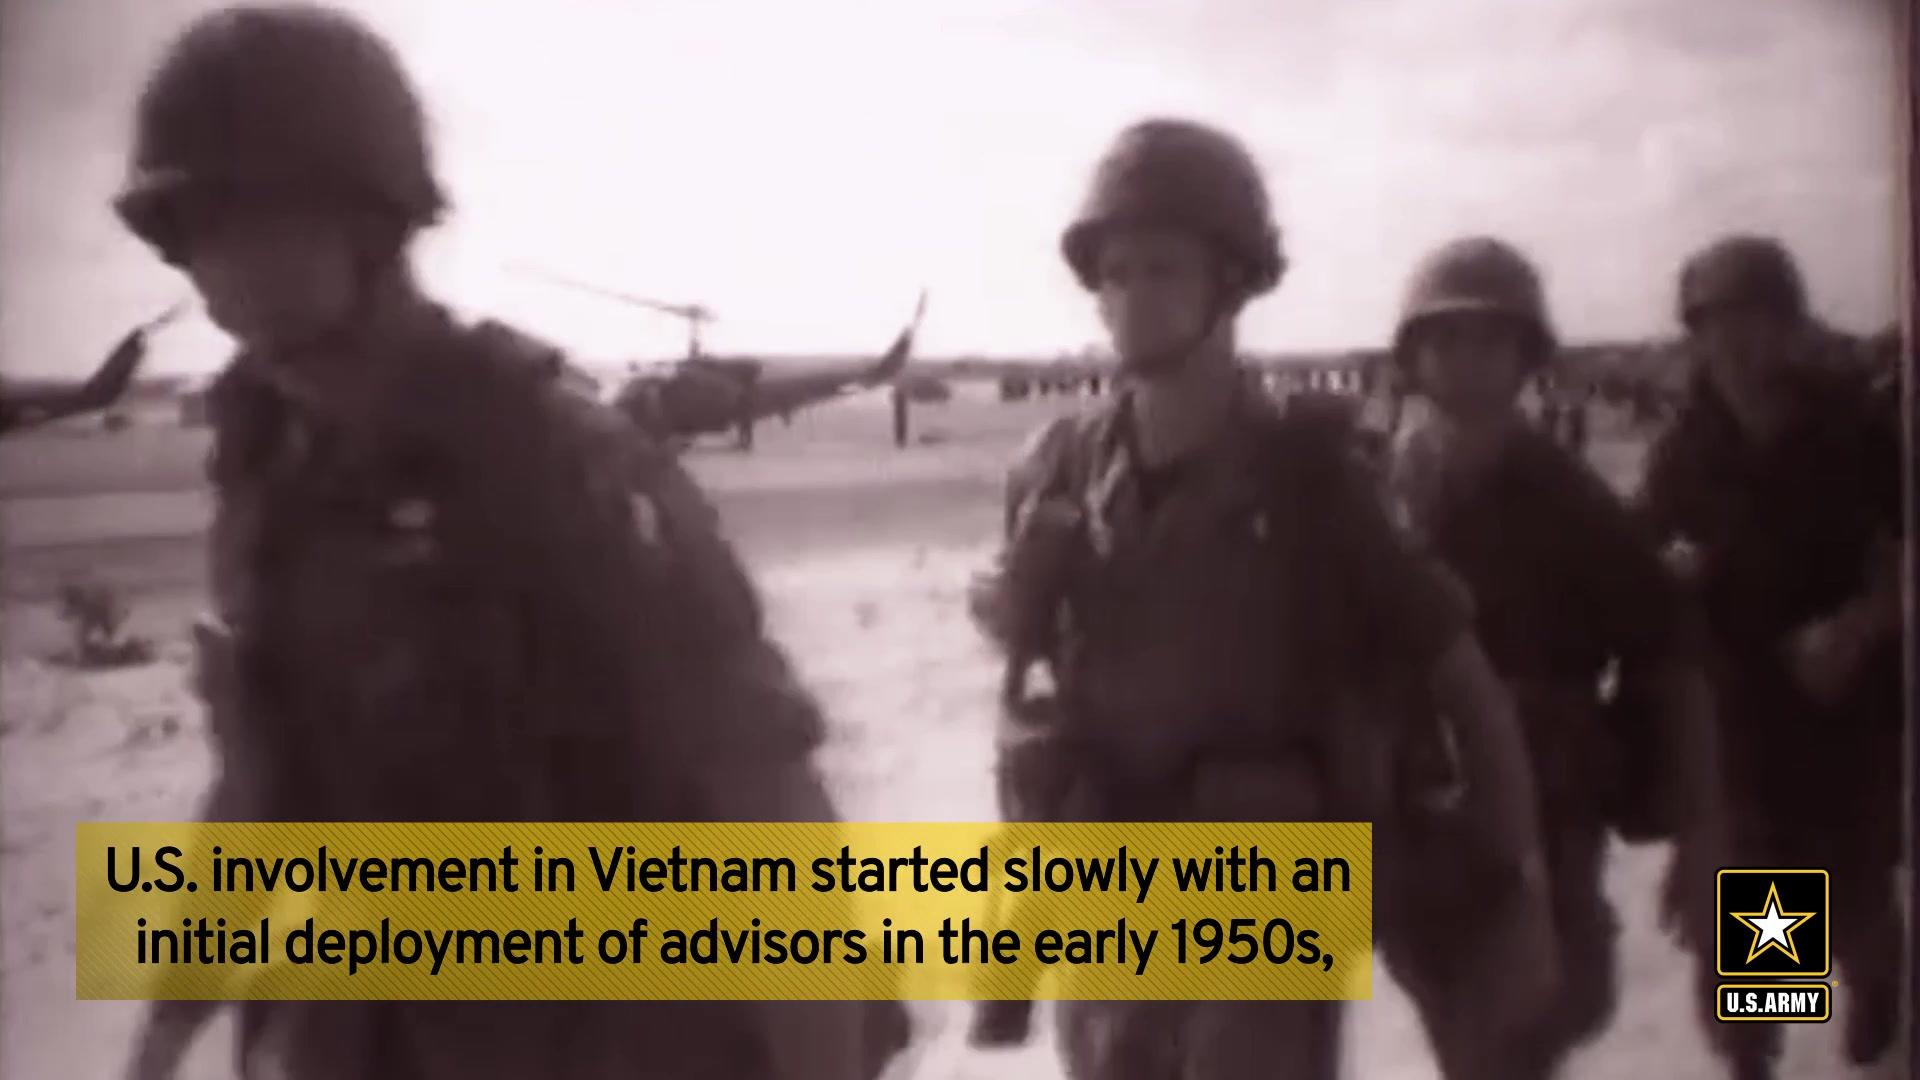 Vietnam War Veterans Day video made for Army social media use.